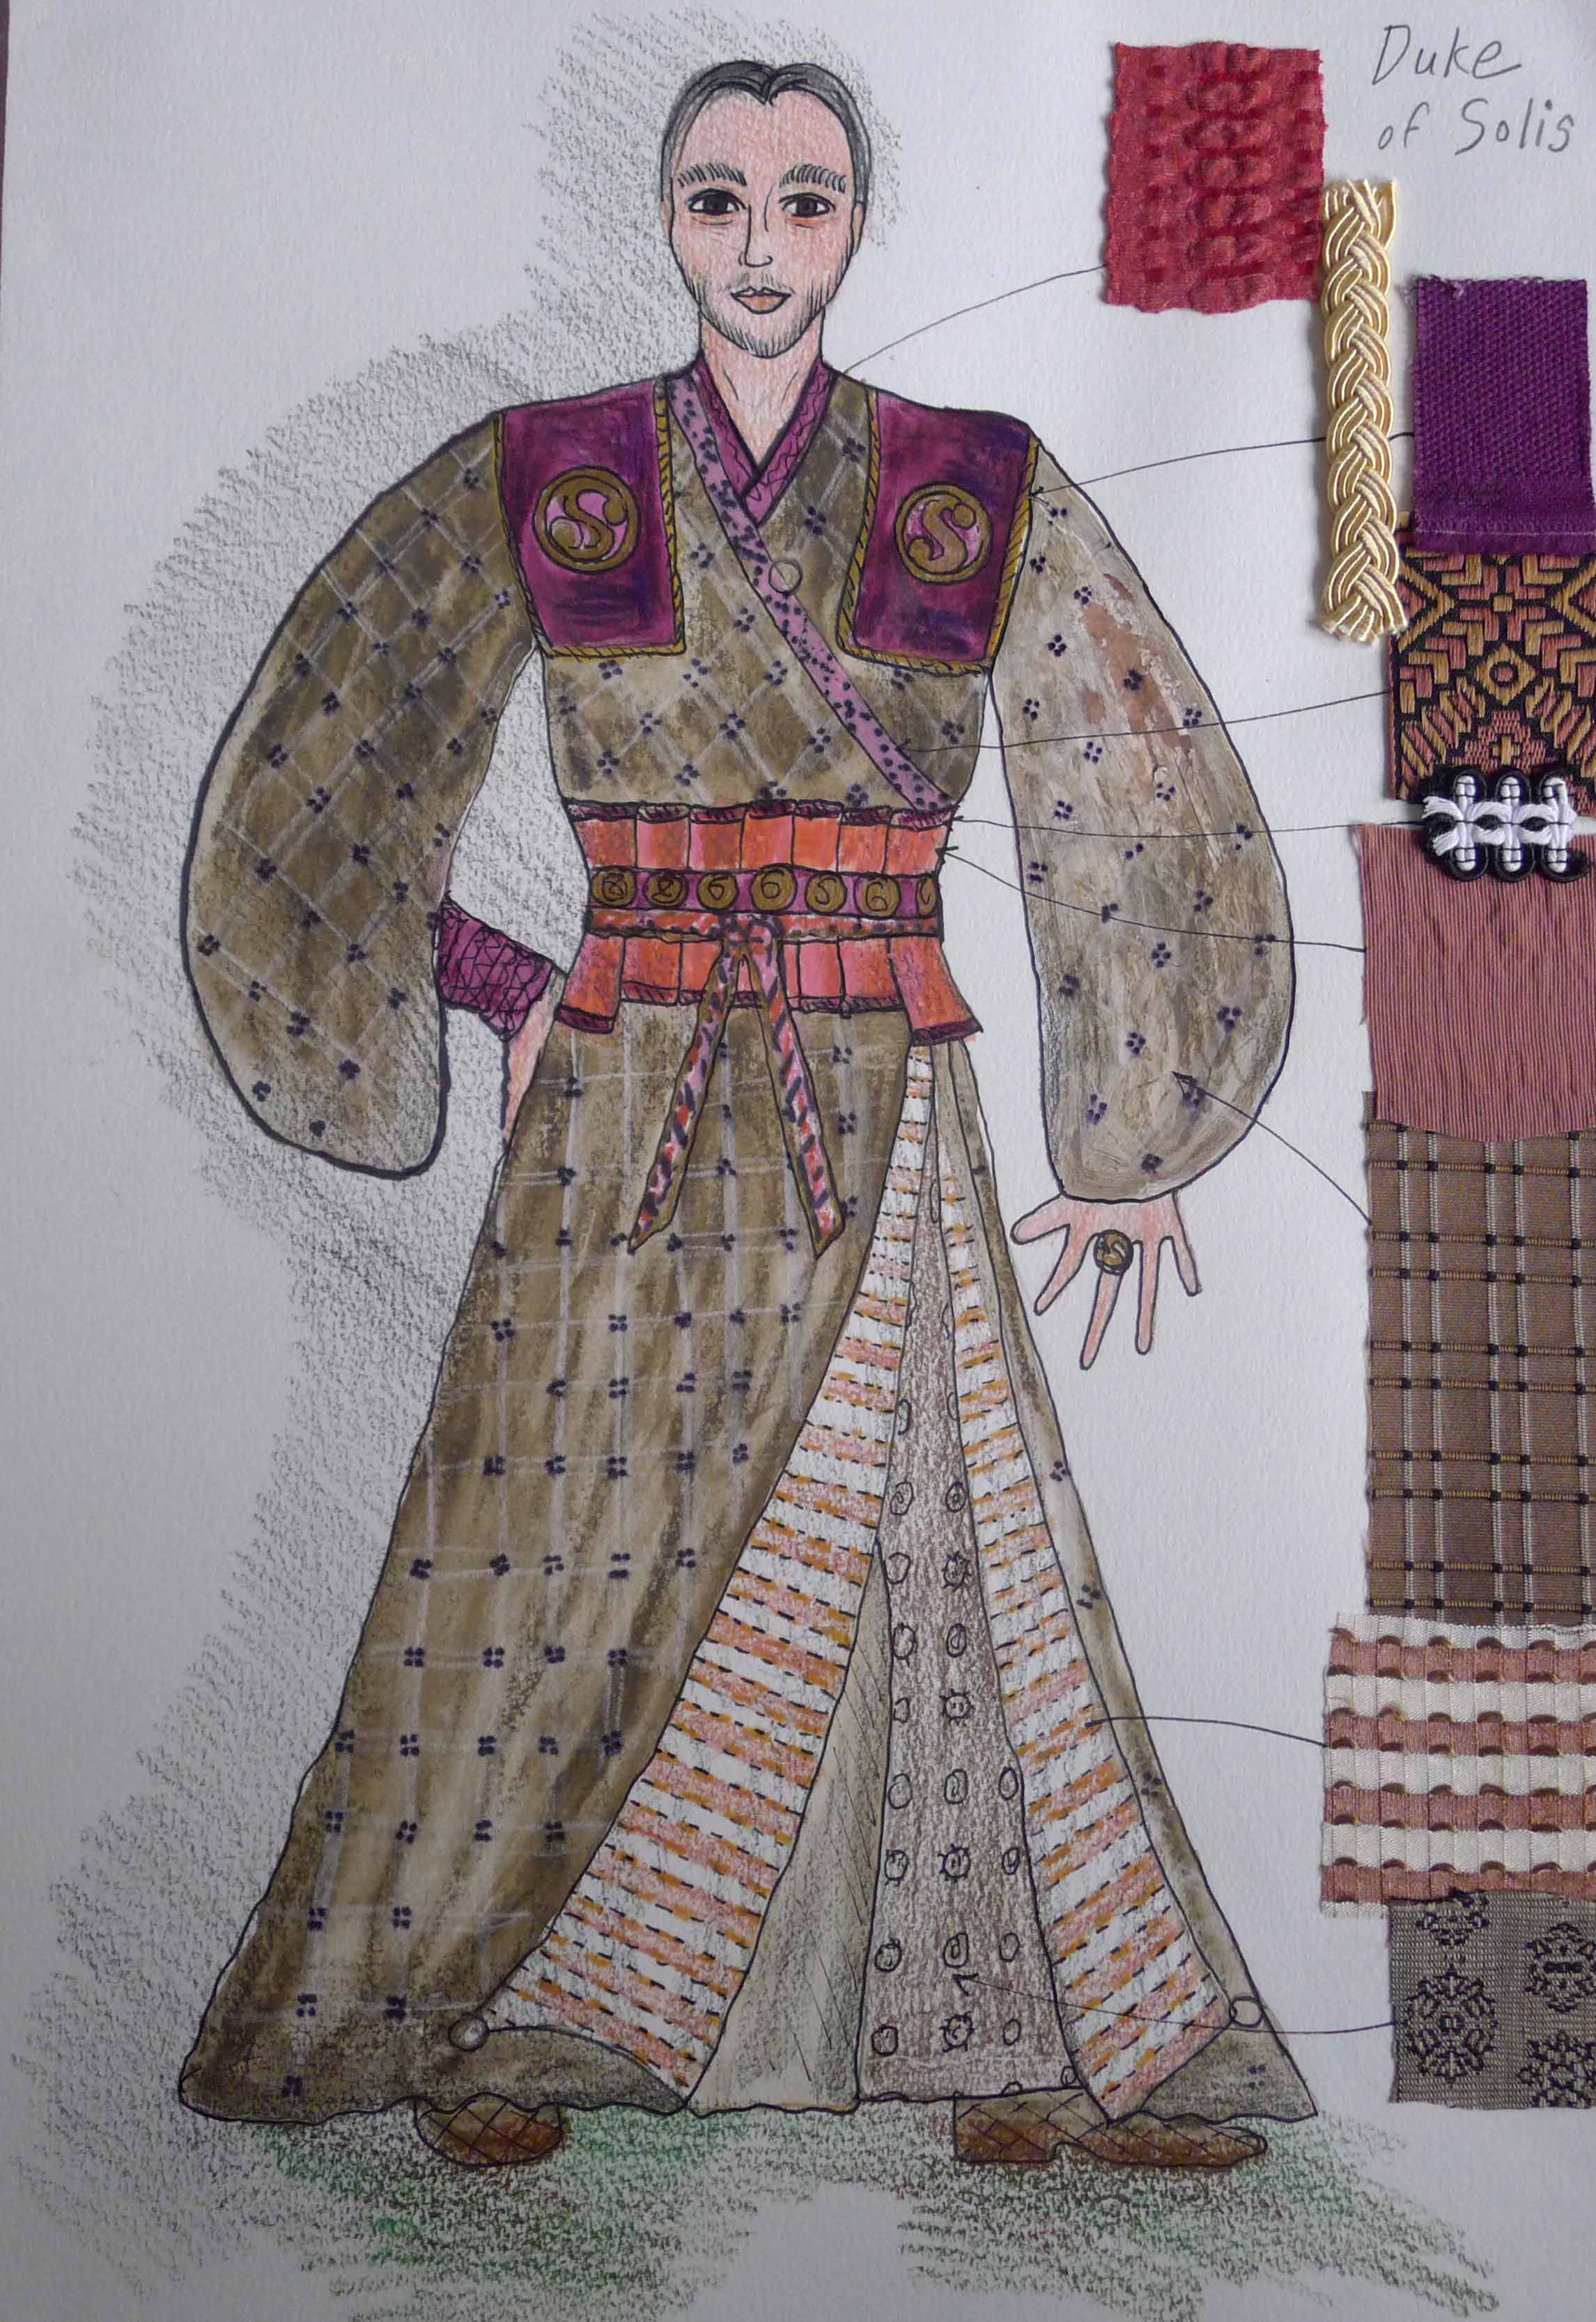 The Duke of Solis costume sketch